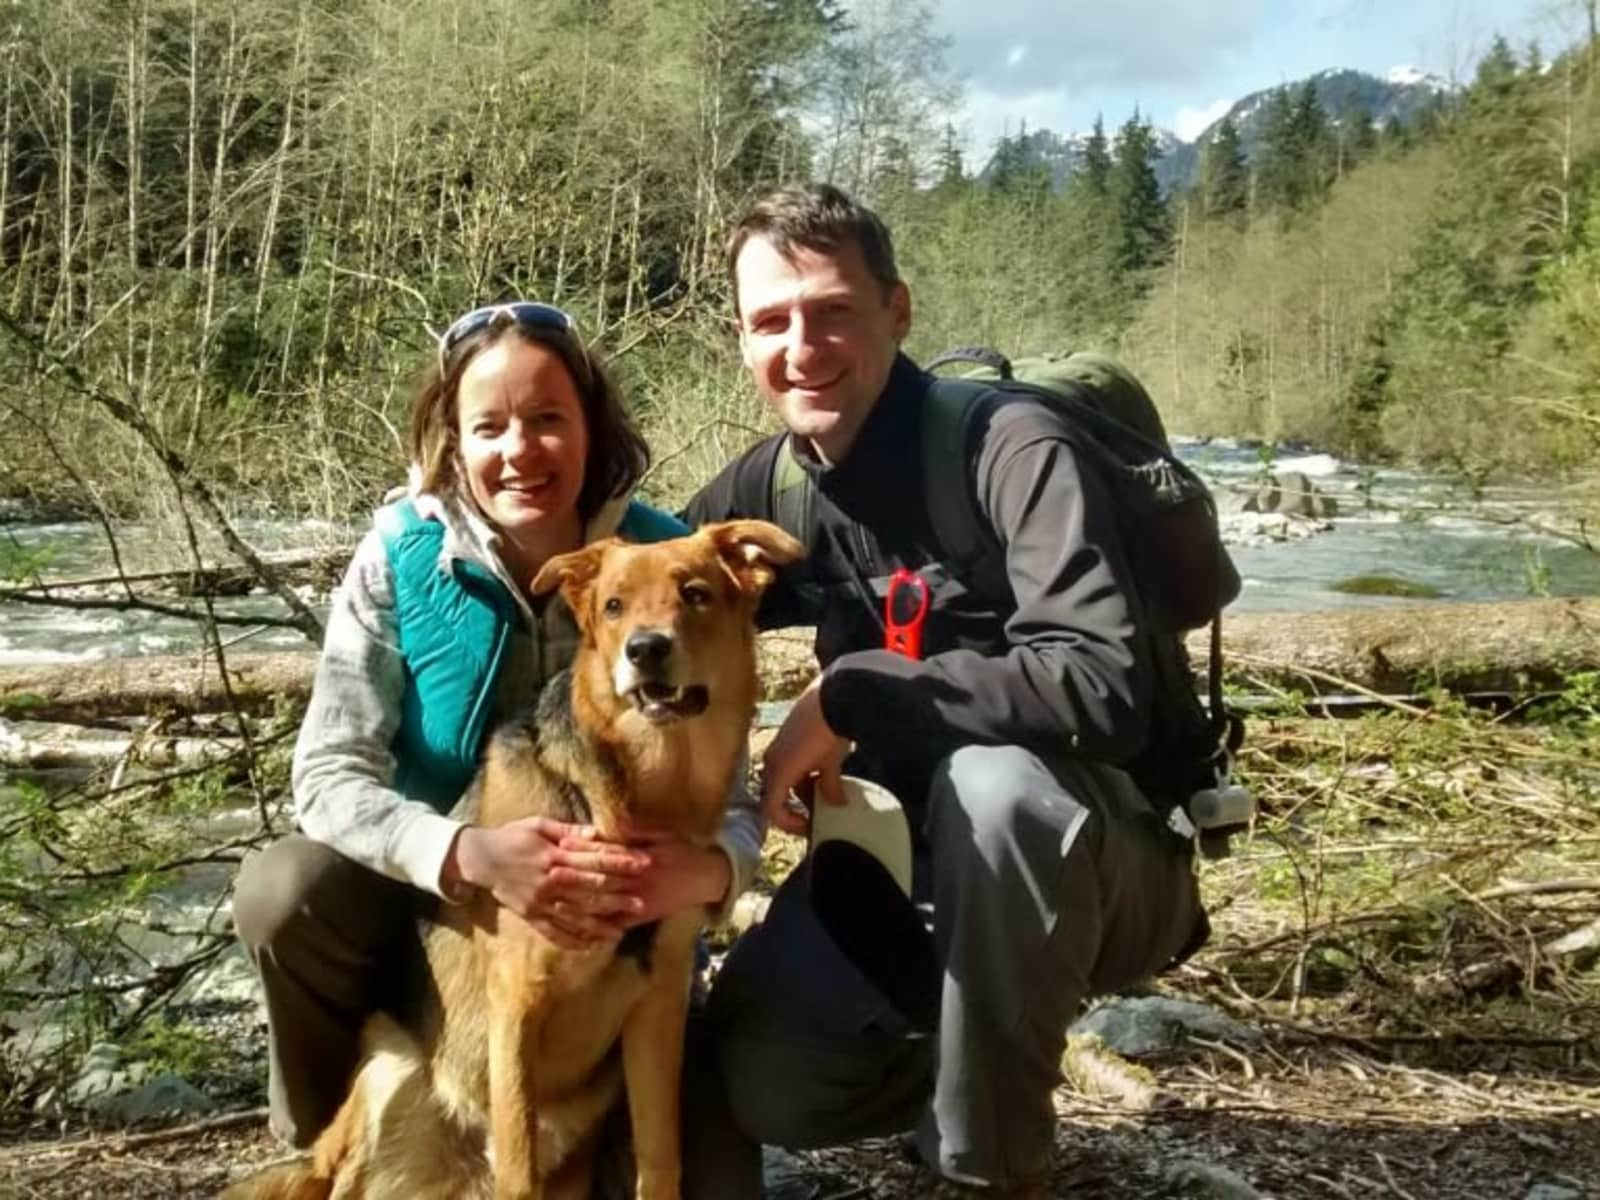 Simon & Deborah from Vancouver, British Columbia, Canada